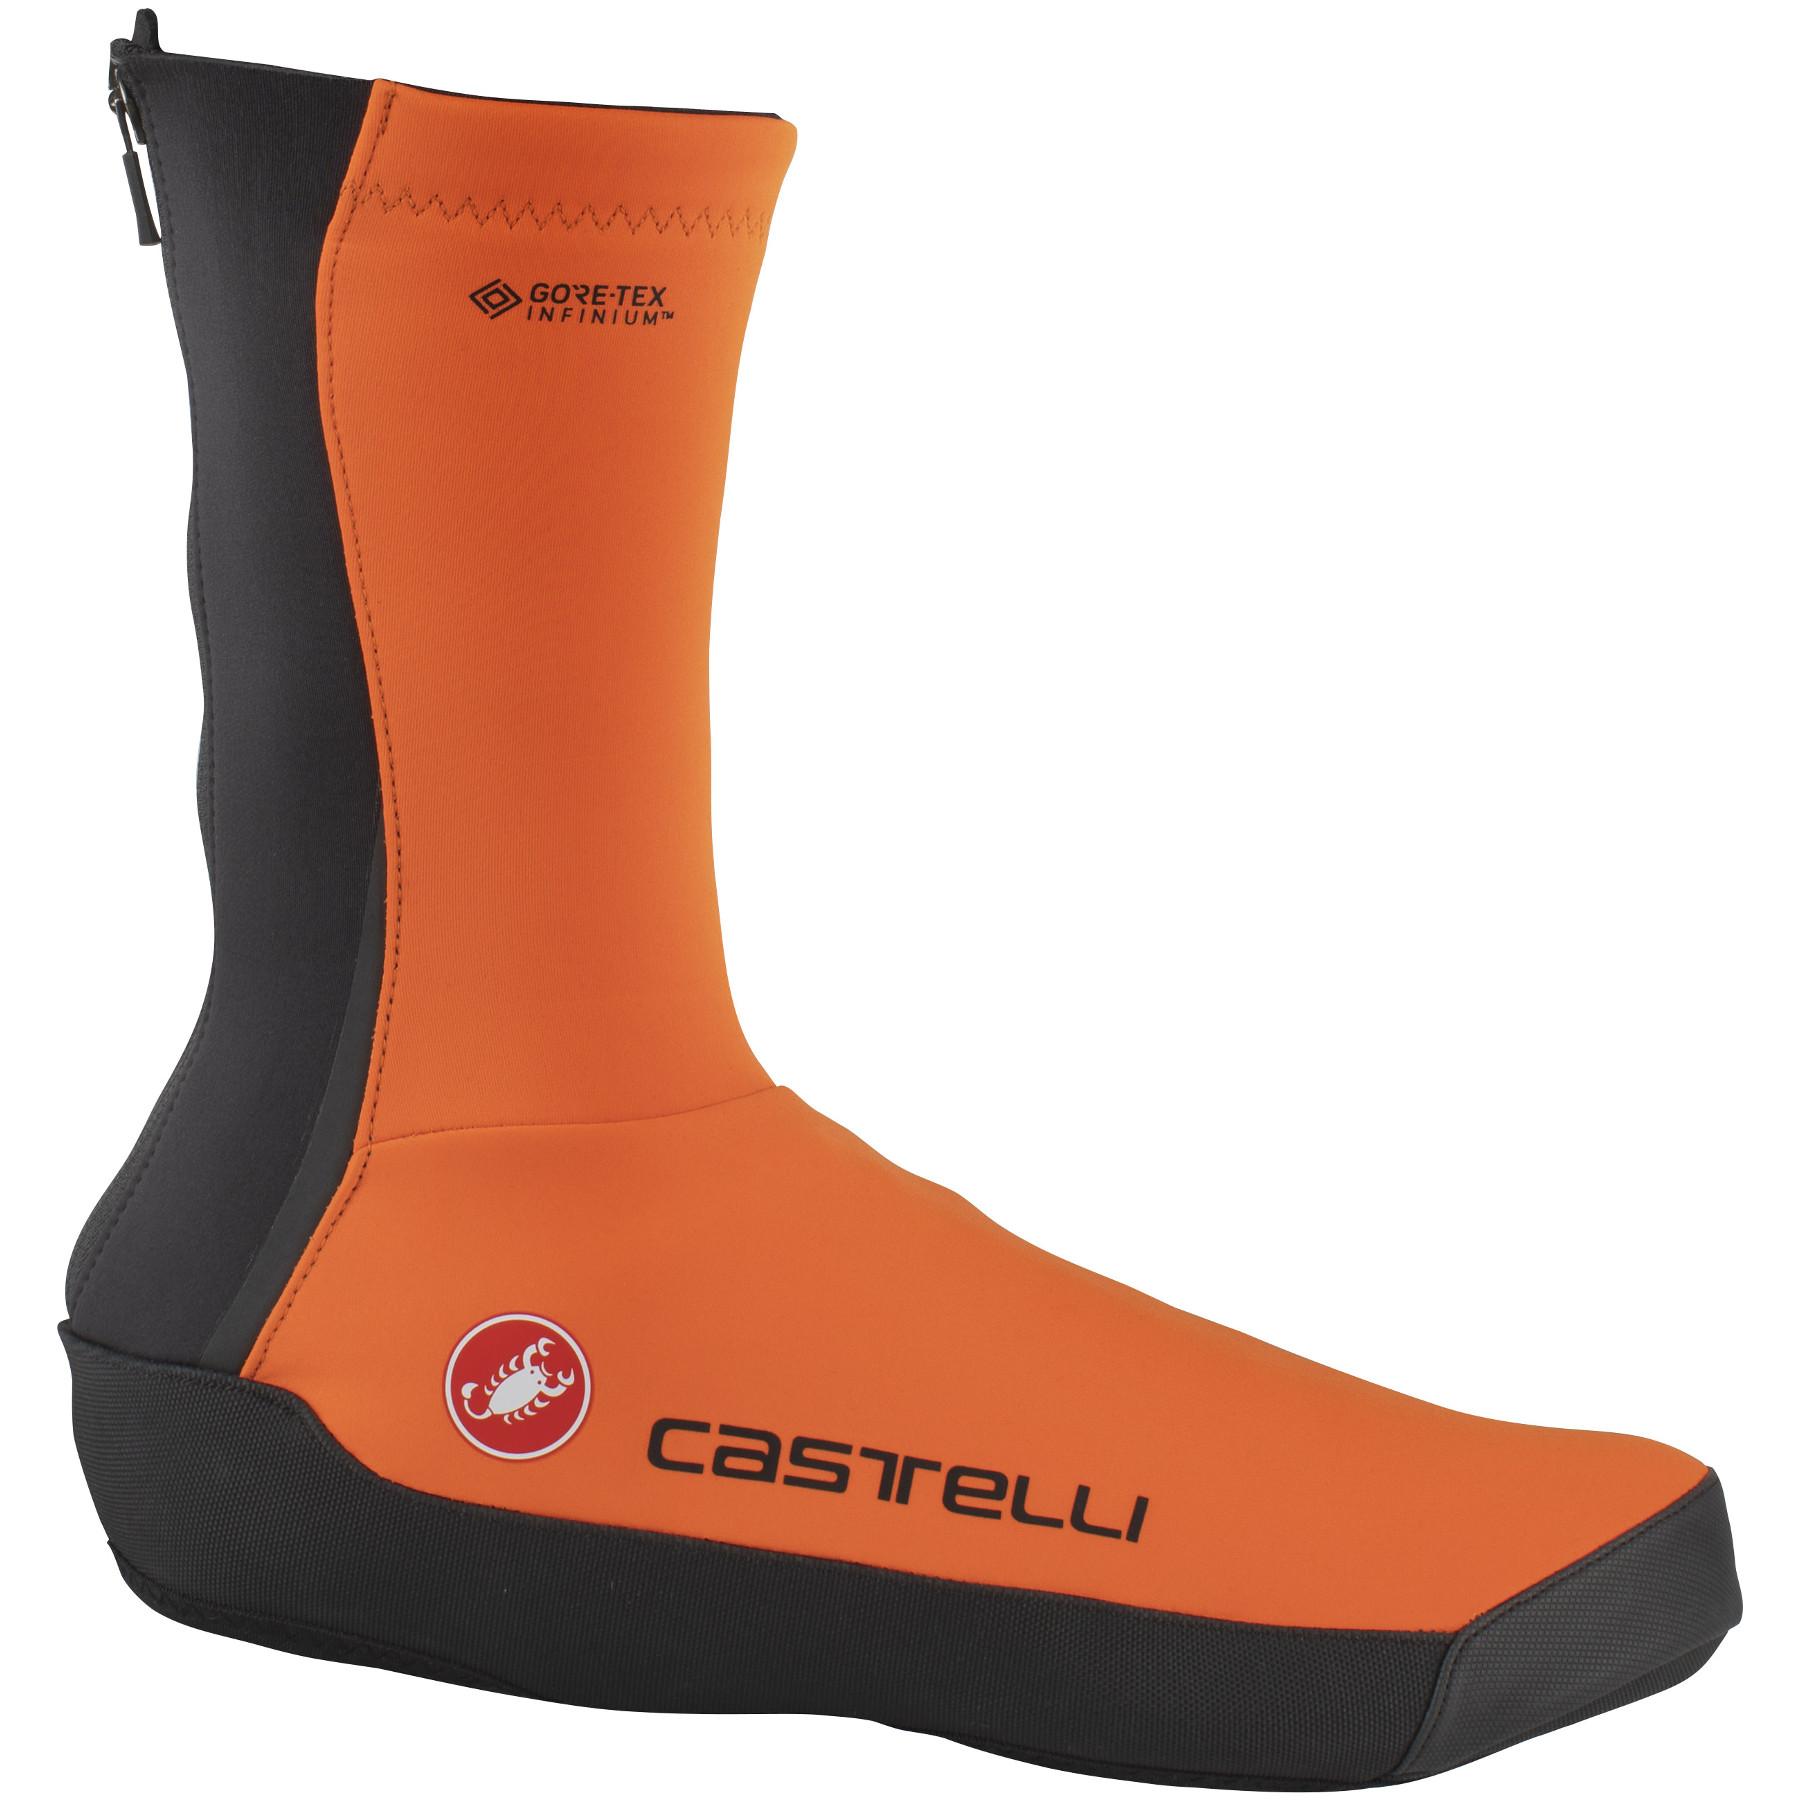 Castelli Intenso UL Überschuhe - orange 034